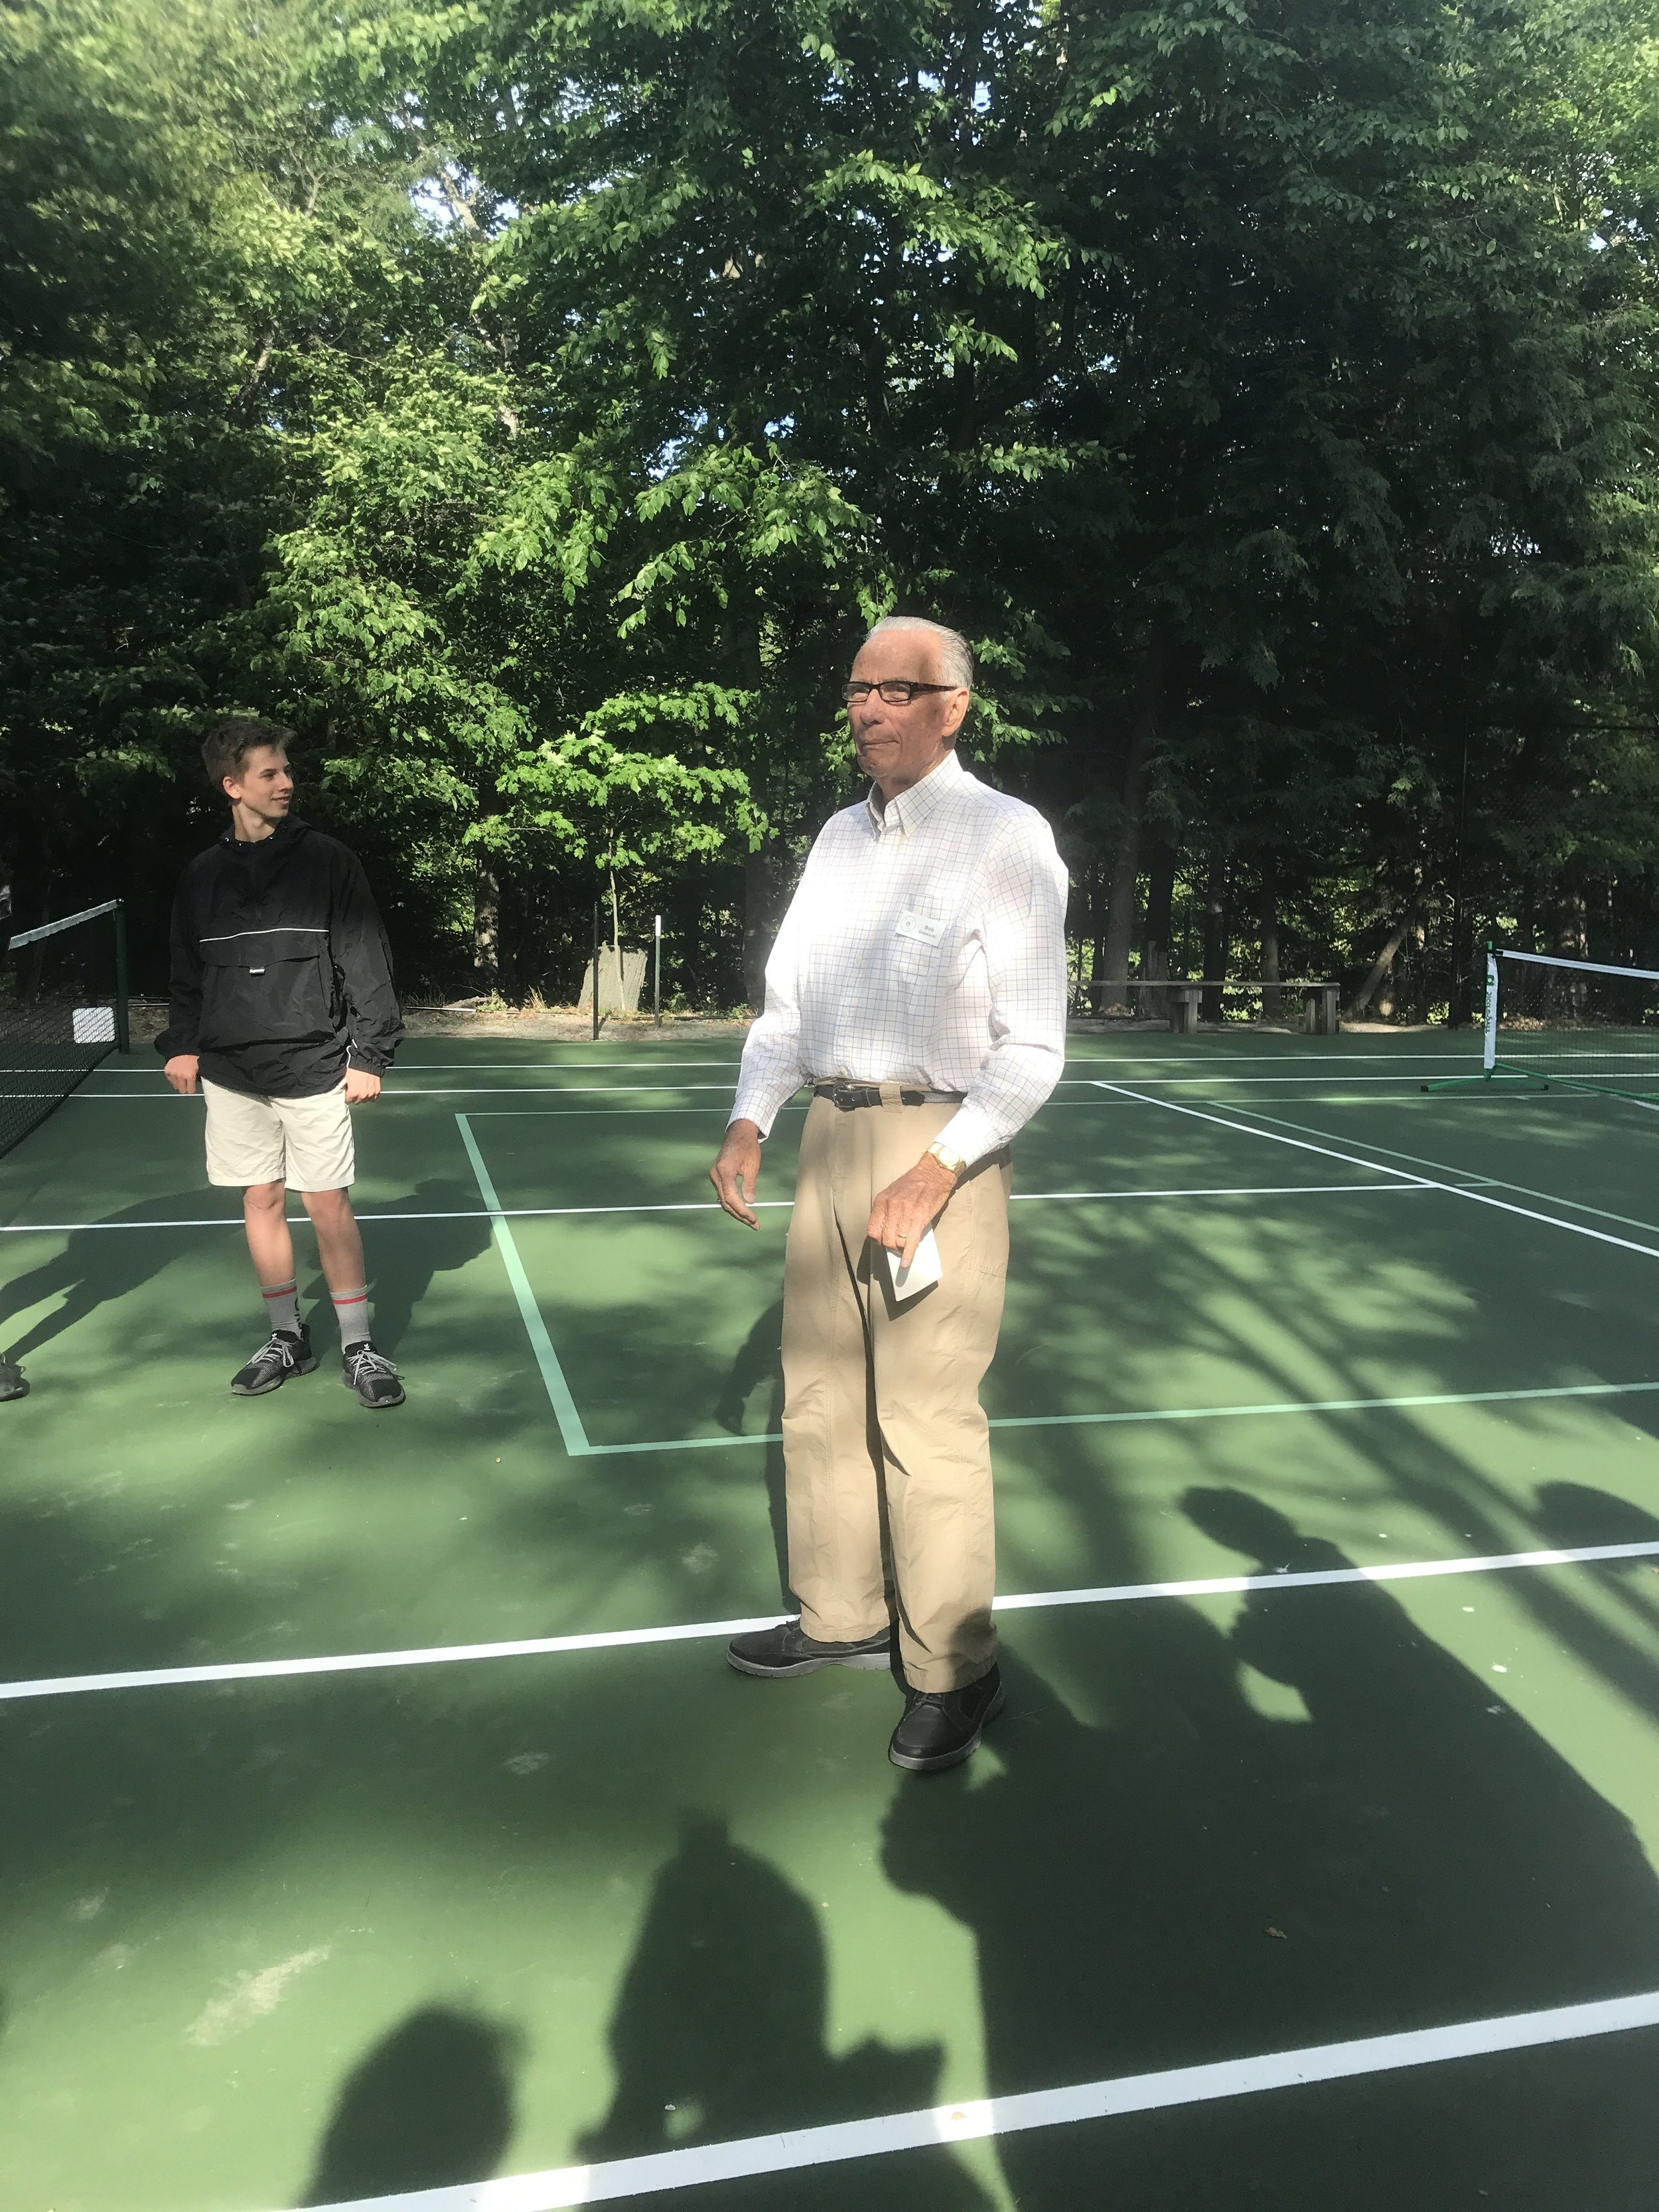 Bob Gelakoski Rededicates the courts